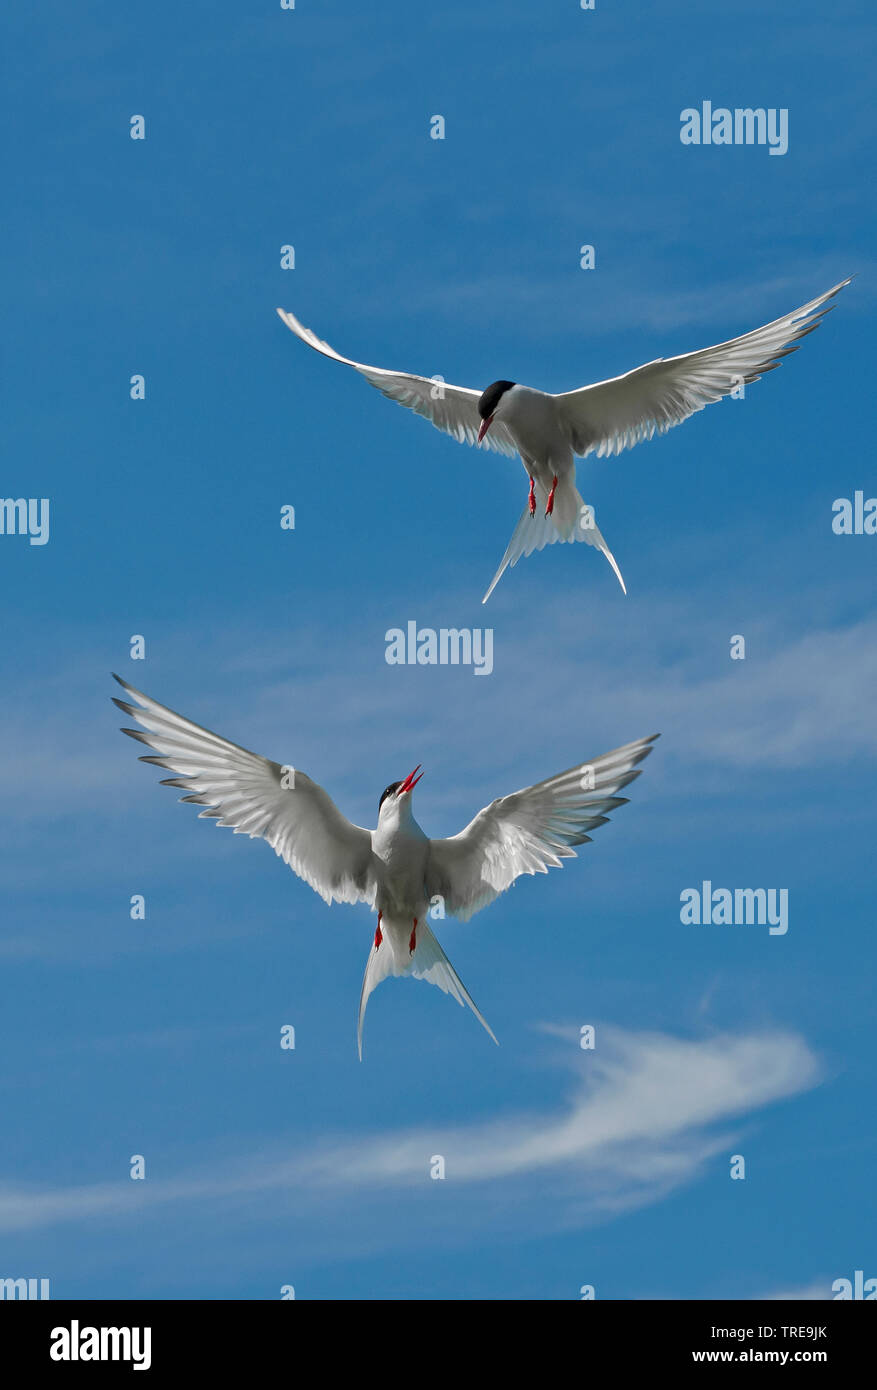 Kuestenseeschwalbe, Kuesten-Seeschwalbe (Sterna paradisaea), zwei Kuestenseeschwalben attackieren sich im Flug, Europa | arctic tern (Sterna paradisae - Stock Image